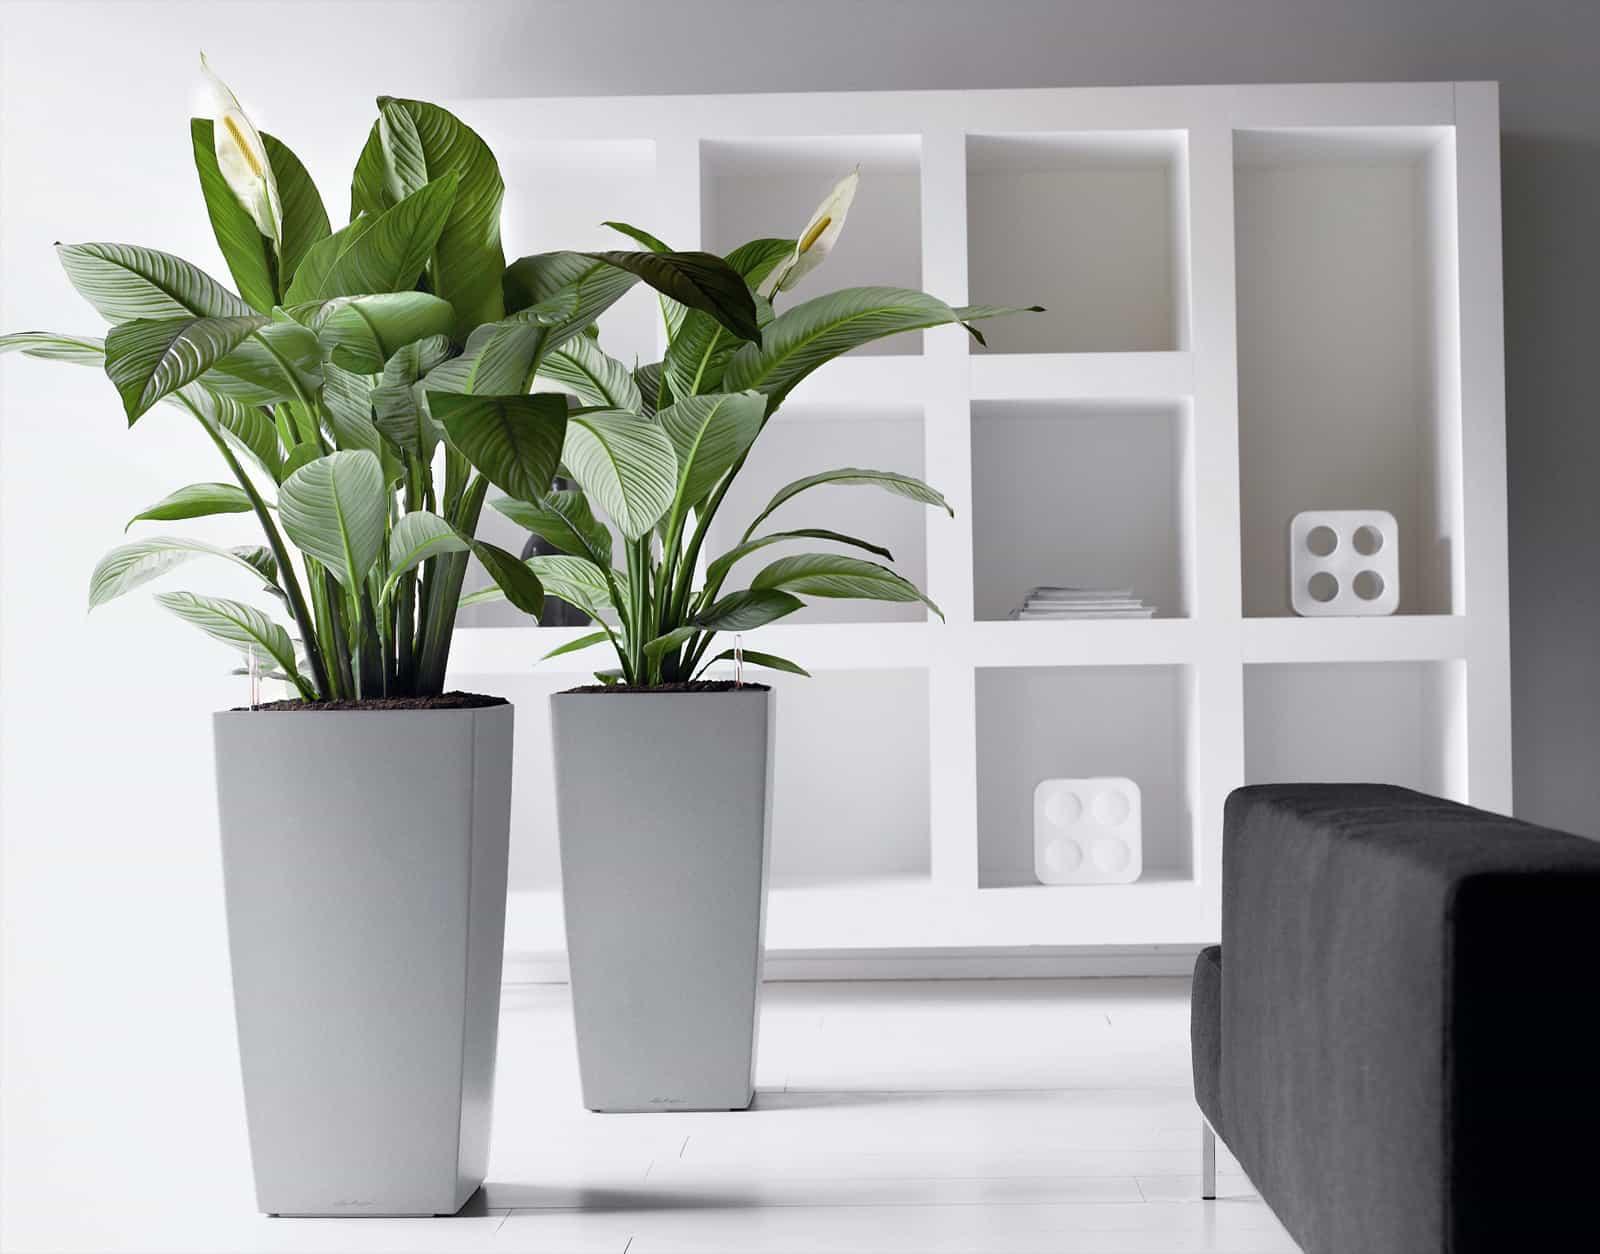 Родина комнатного растения спатифиллум. Уход, описание, видео